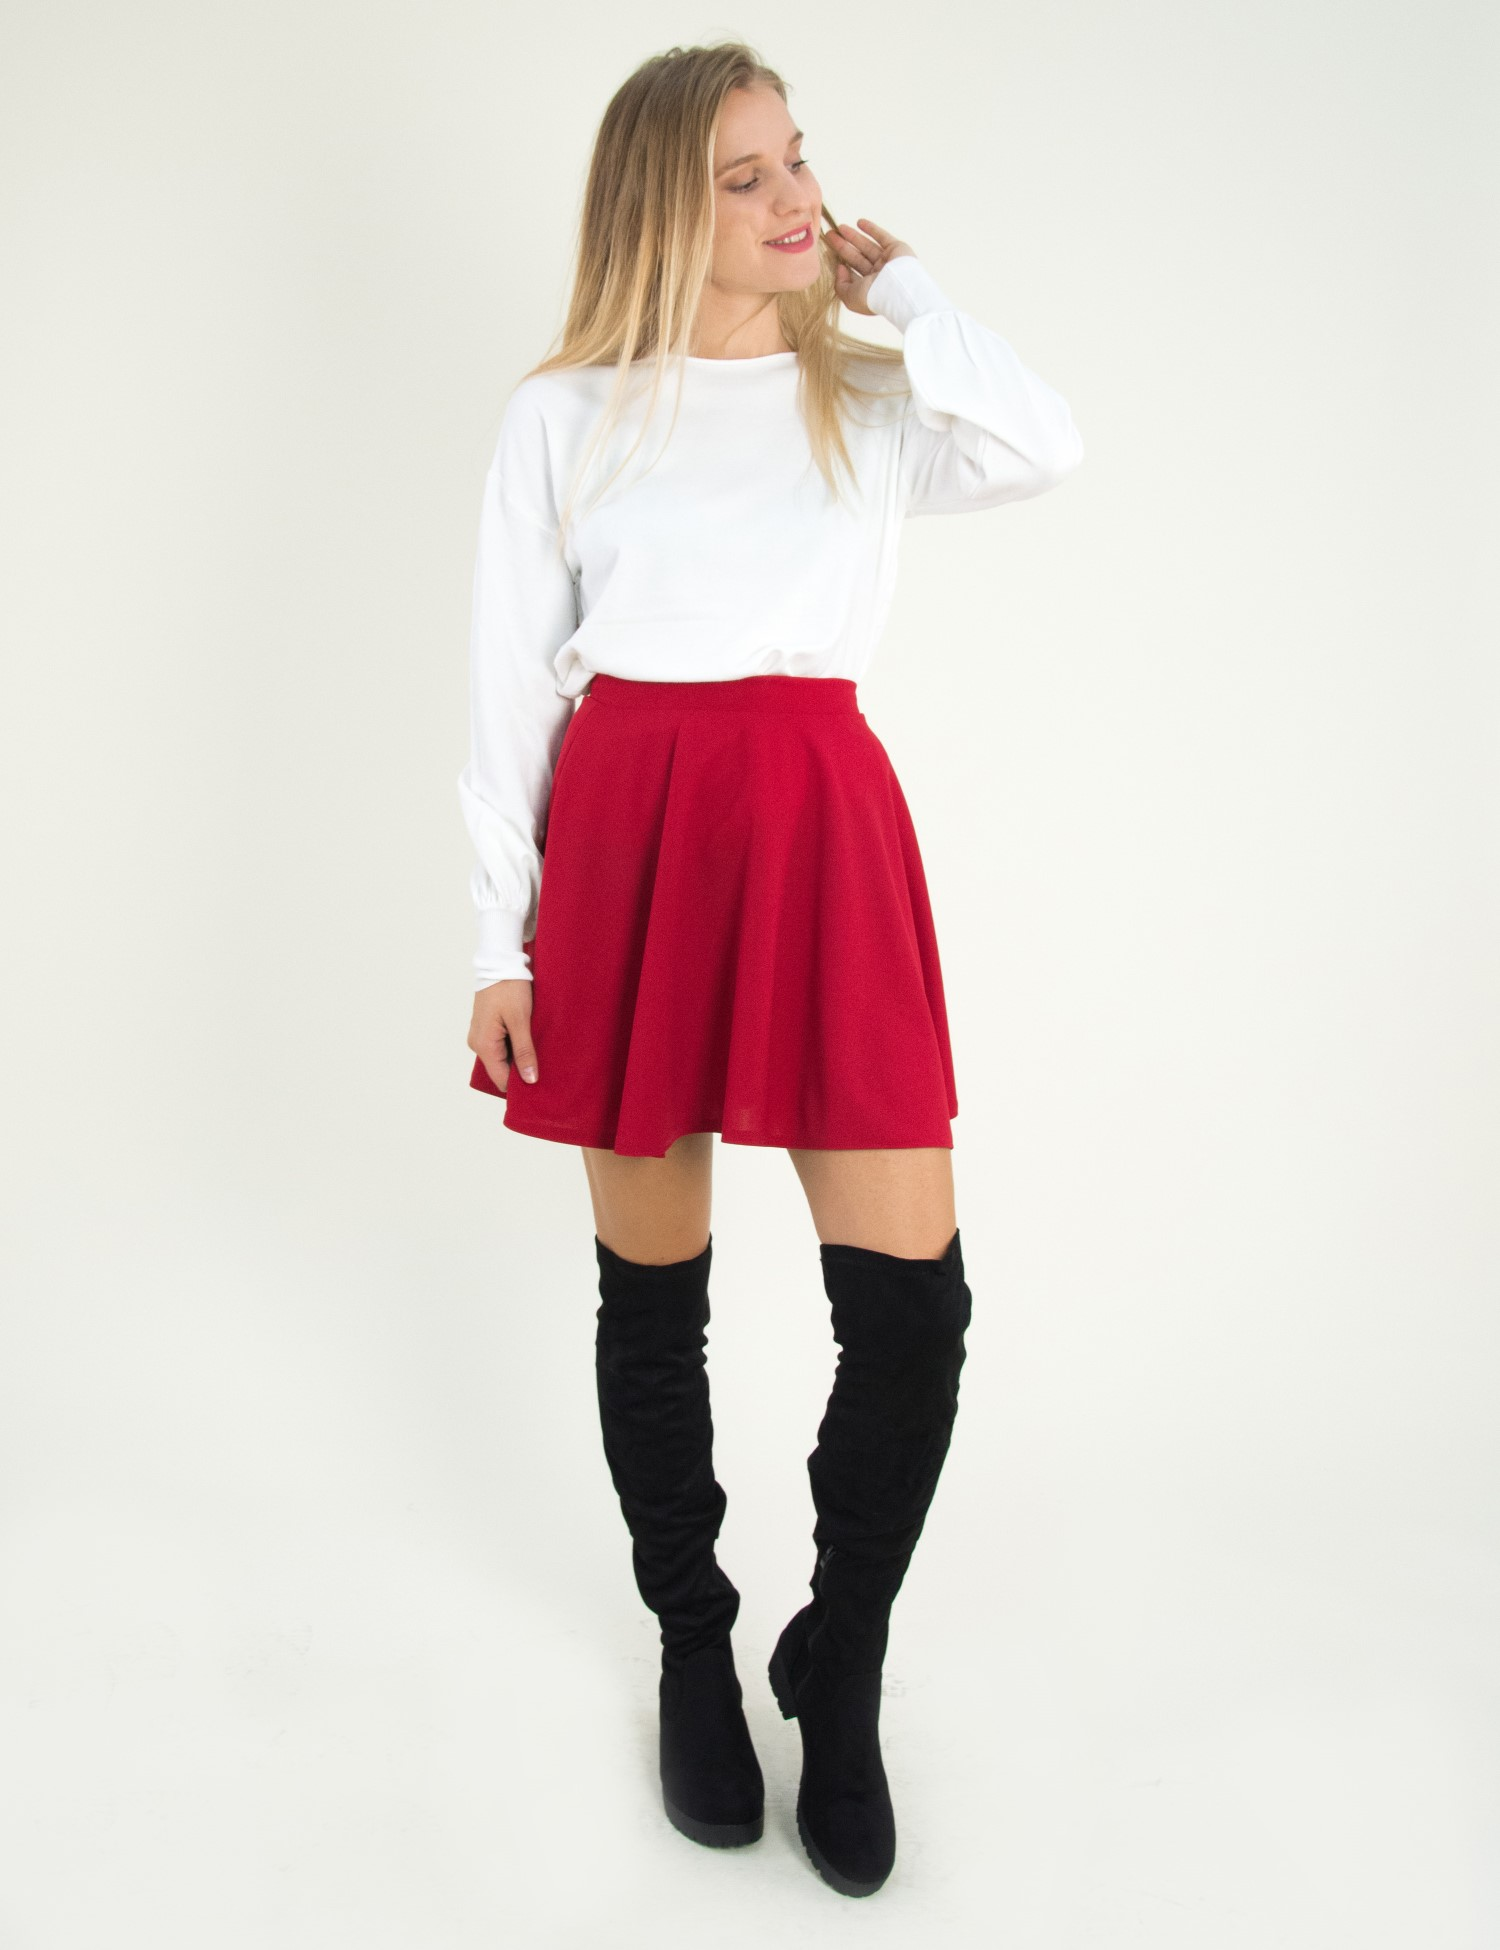 b607c79f83d2 Πολυ φθηνες  0 ως 1080  Γυναικείες Φούστες 2019 από το toRouxo.gr